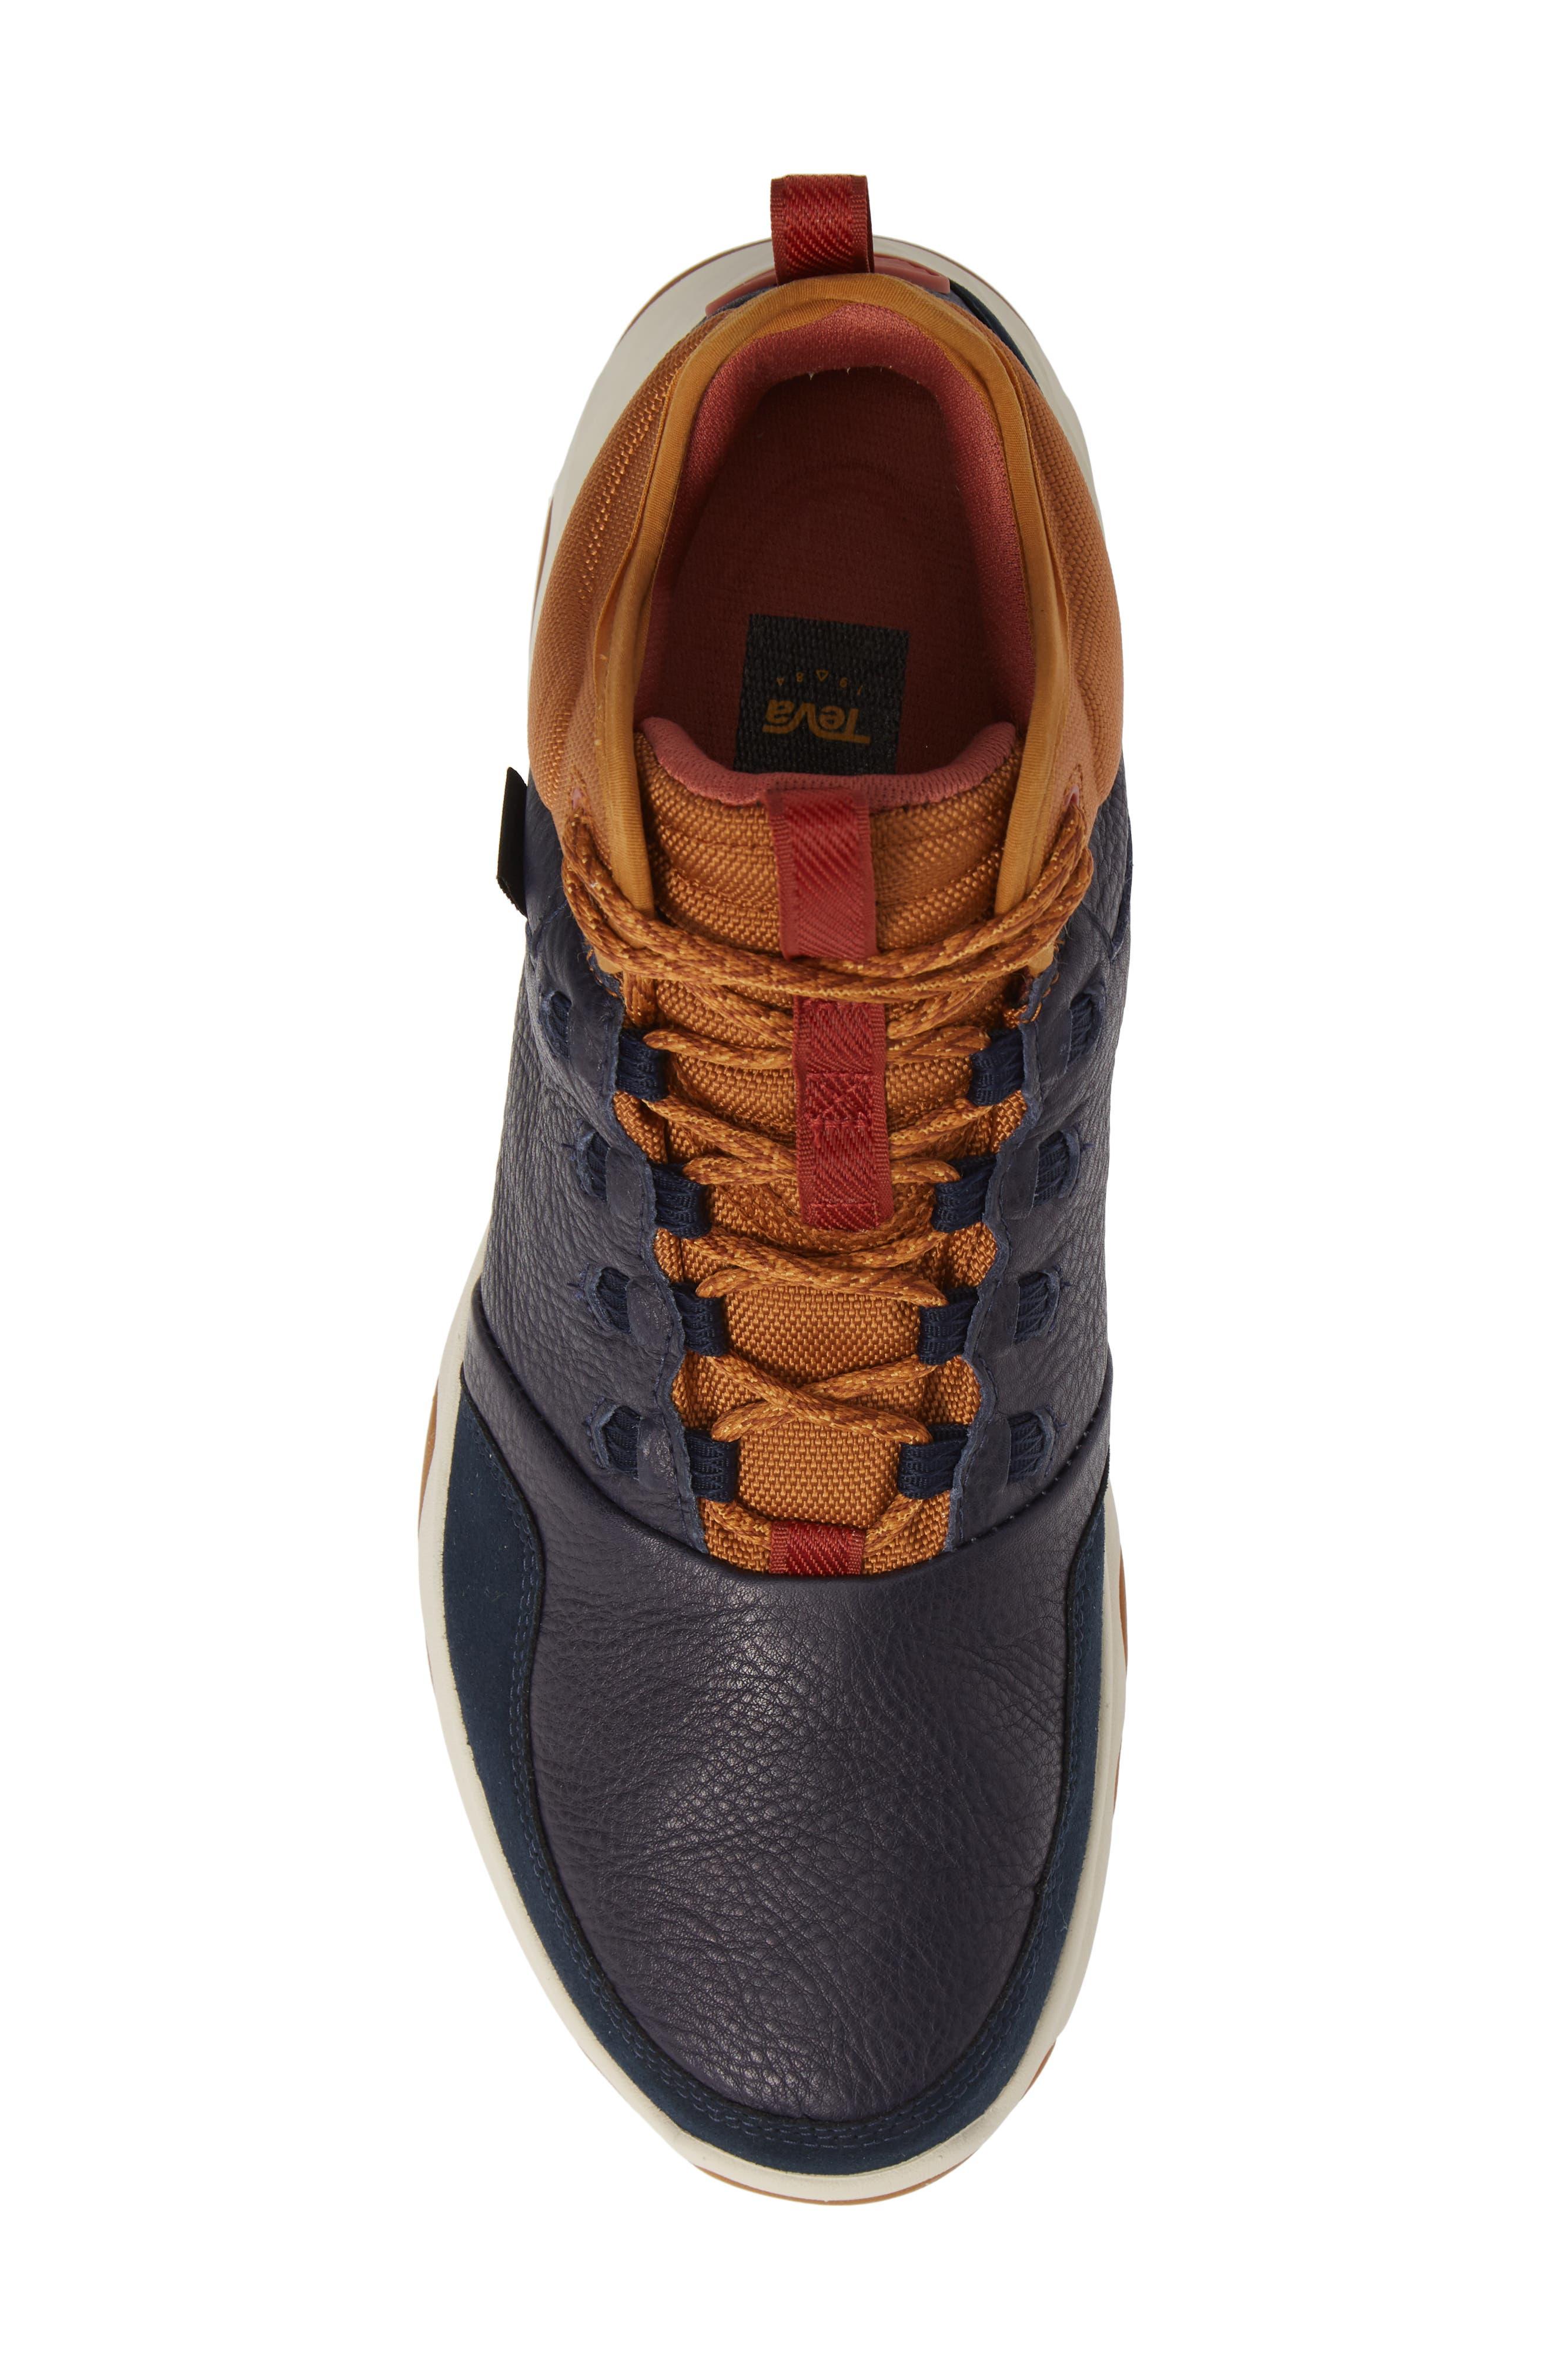 Arrowood 2 Mid Waterproof Sneaker Boot,                             Alternate thumbnail 5, color,                             MIDNIGHT NAVY LEATHER